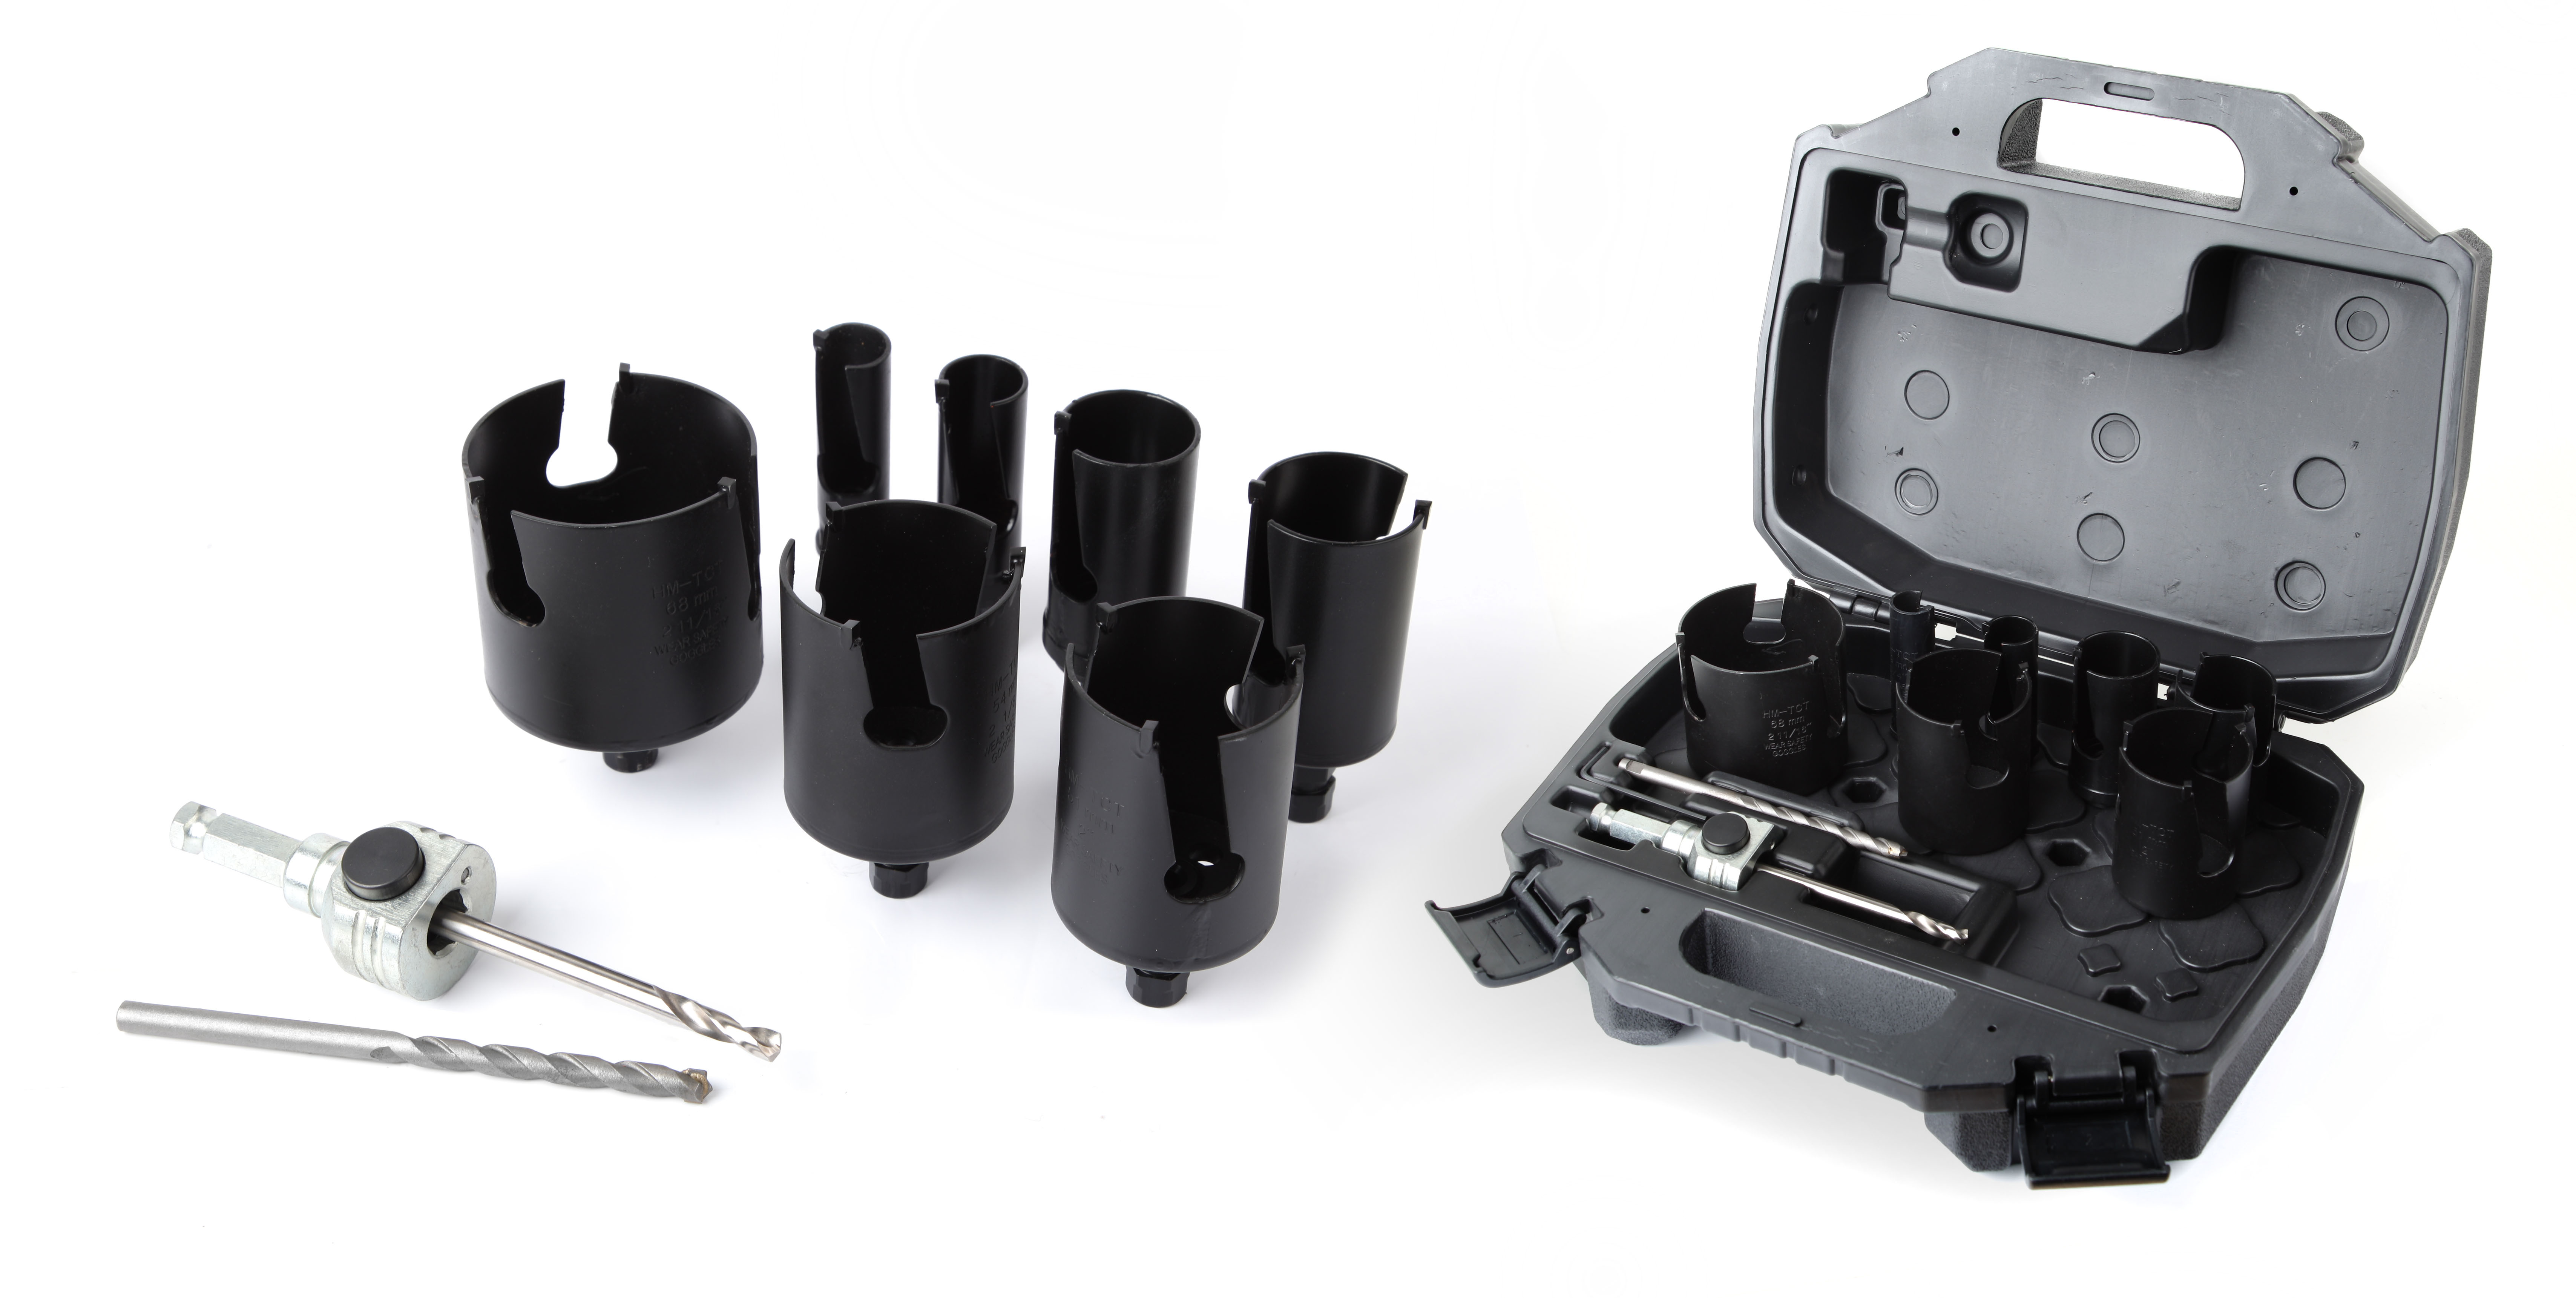 Drilling Carbide hole saw Multi purpose hole saw set sizes ø19-25-32-38-44-57-68 + pilote + 2 drill bit - 3000E.jpg